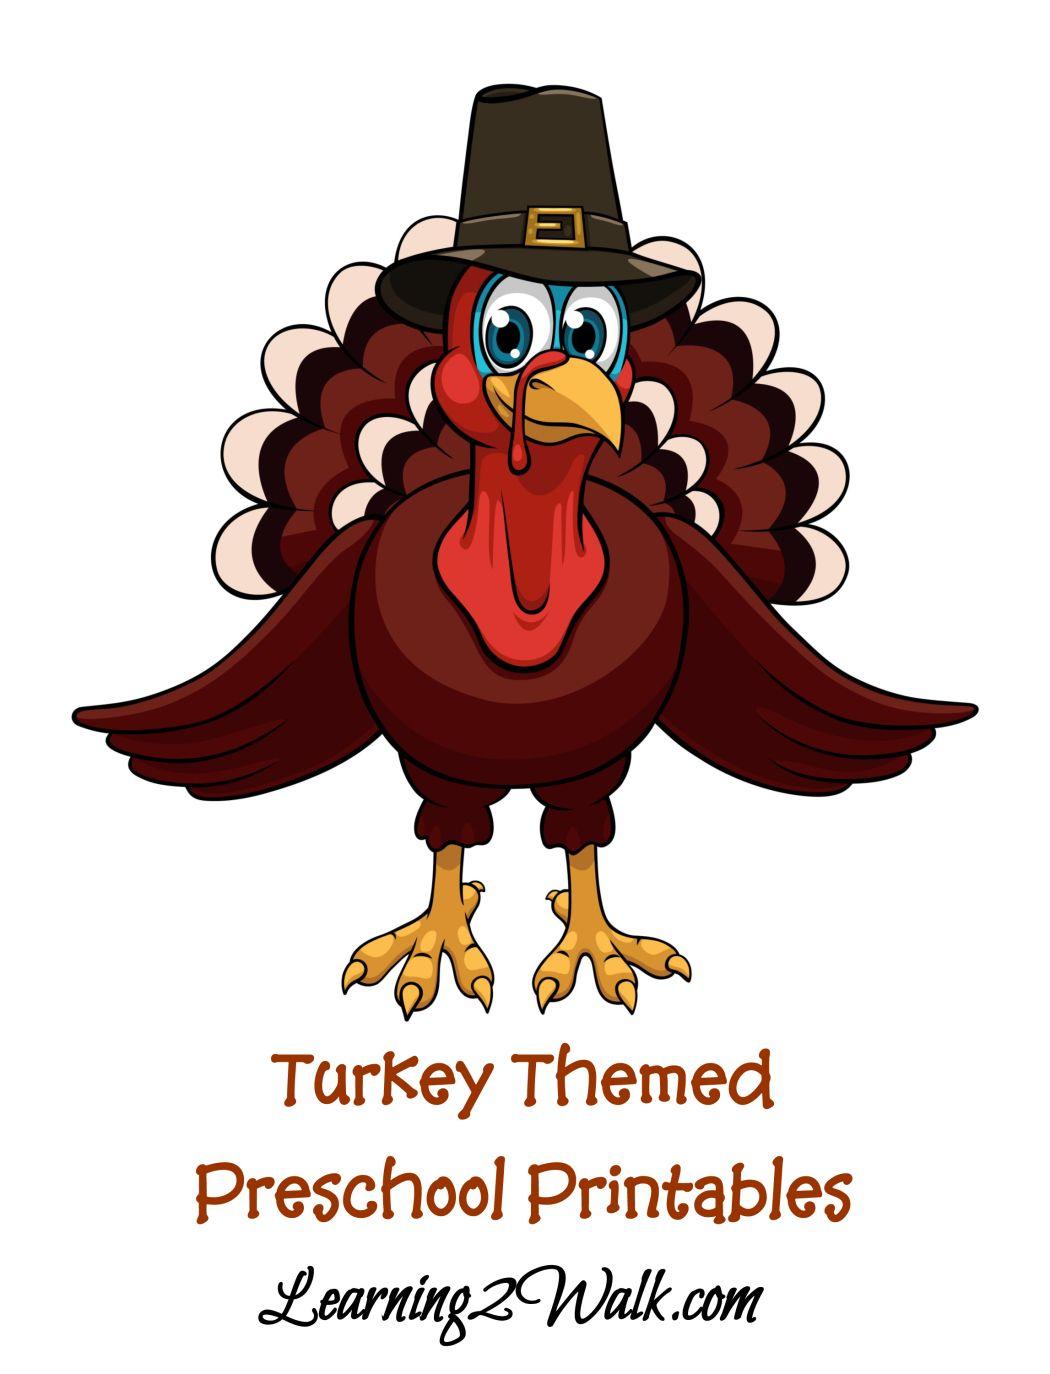 Free Turkey Printable Preschool Kit